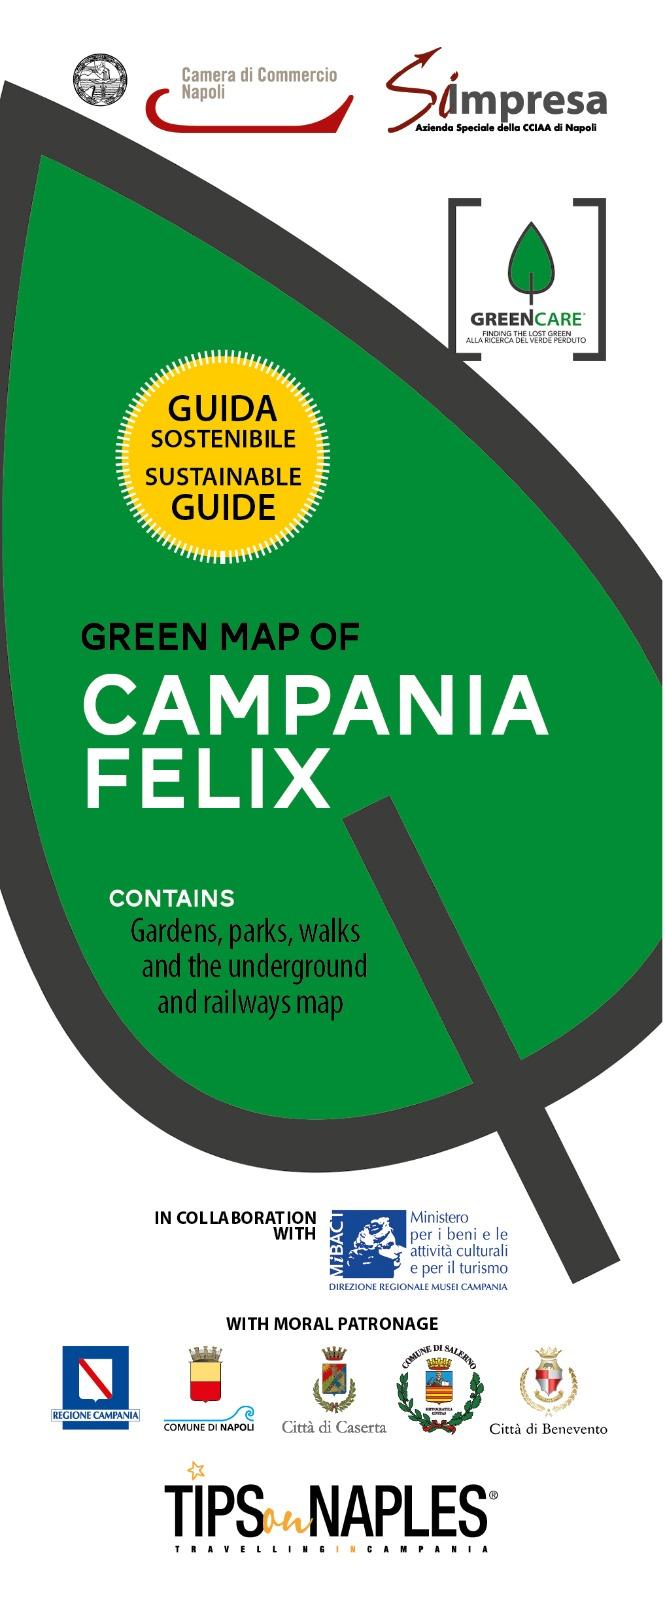 Green Map of Campania Felix